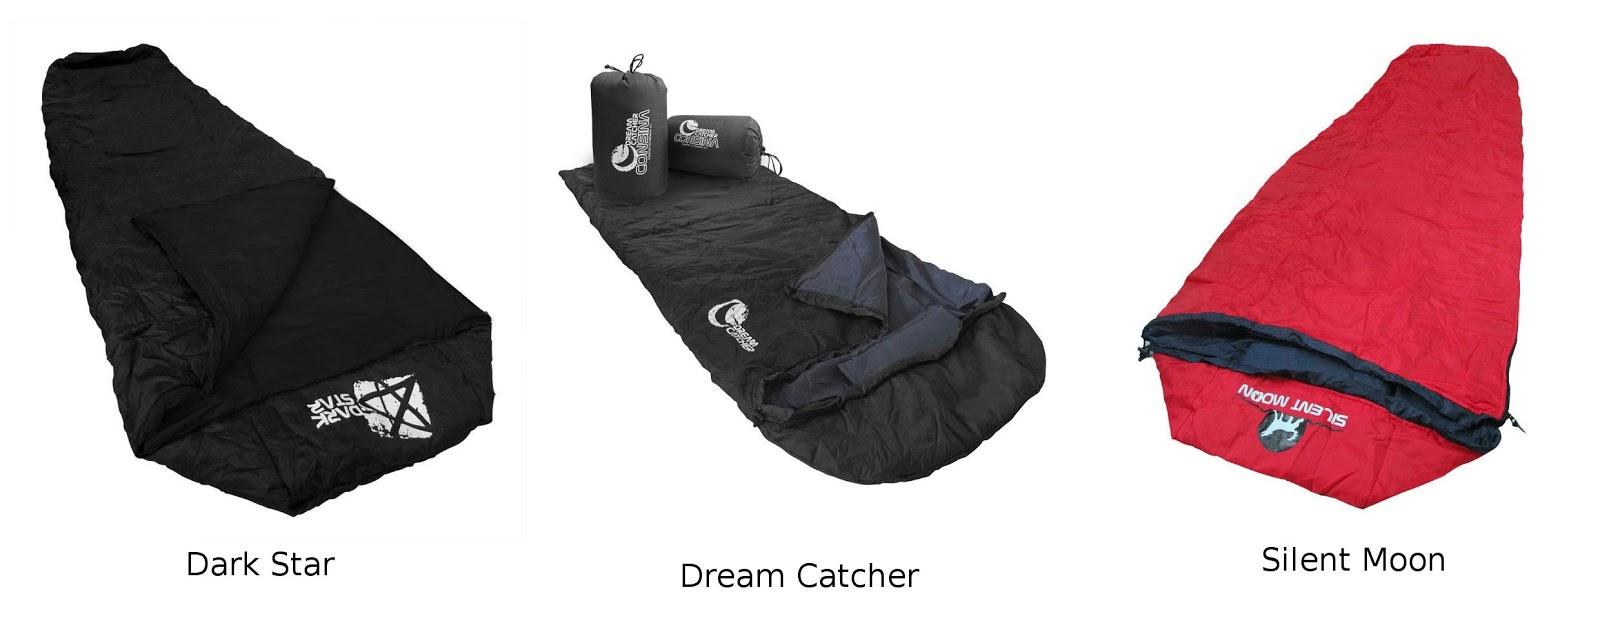 Sleeping Bag Consina Silent Moon Baik Expedition Sb Source Sleepingbag Kataraft Outdoor Sport Equipment Supply